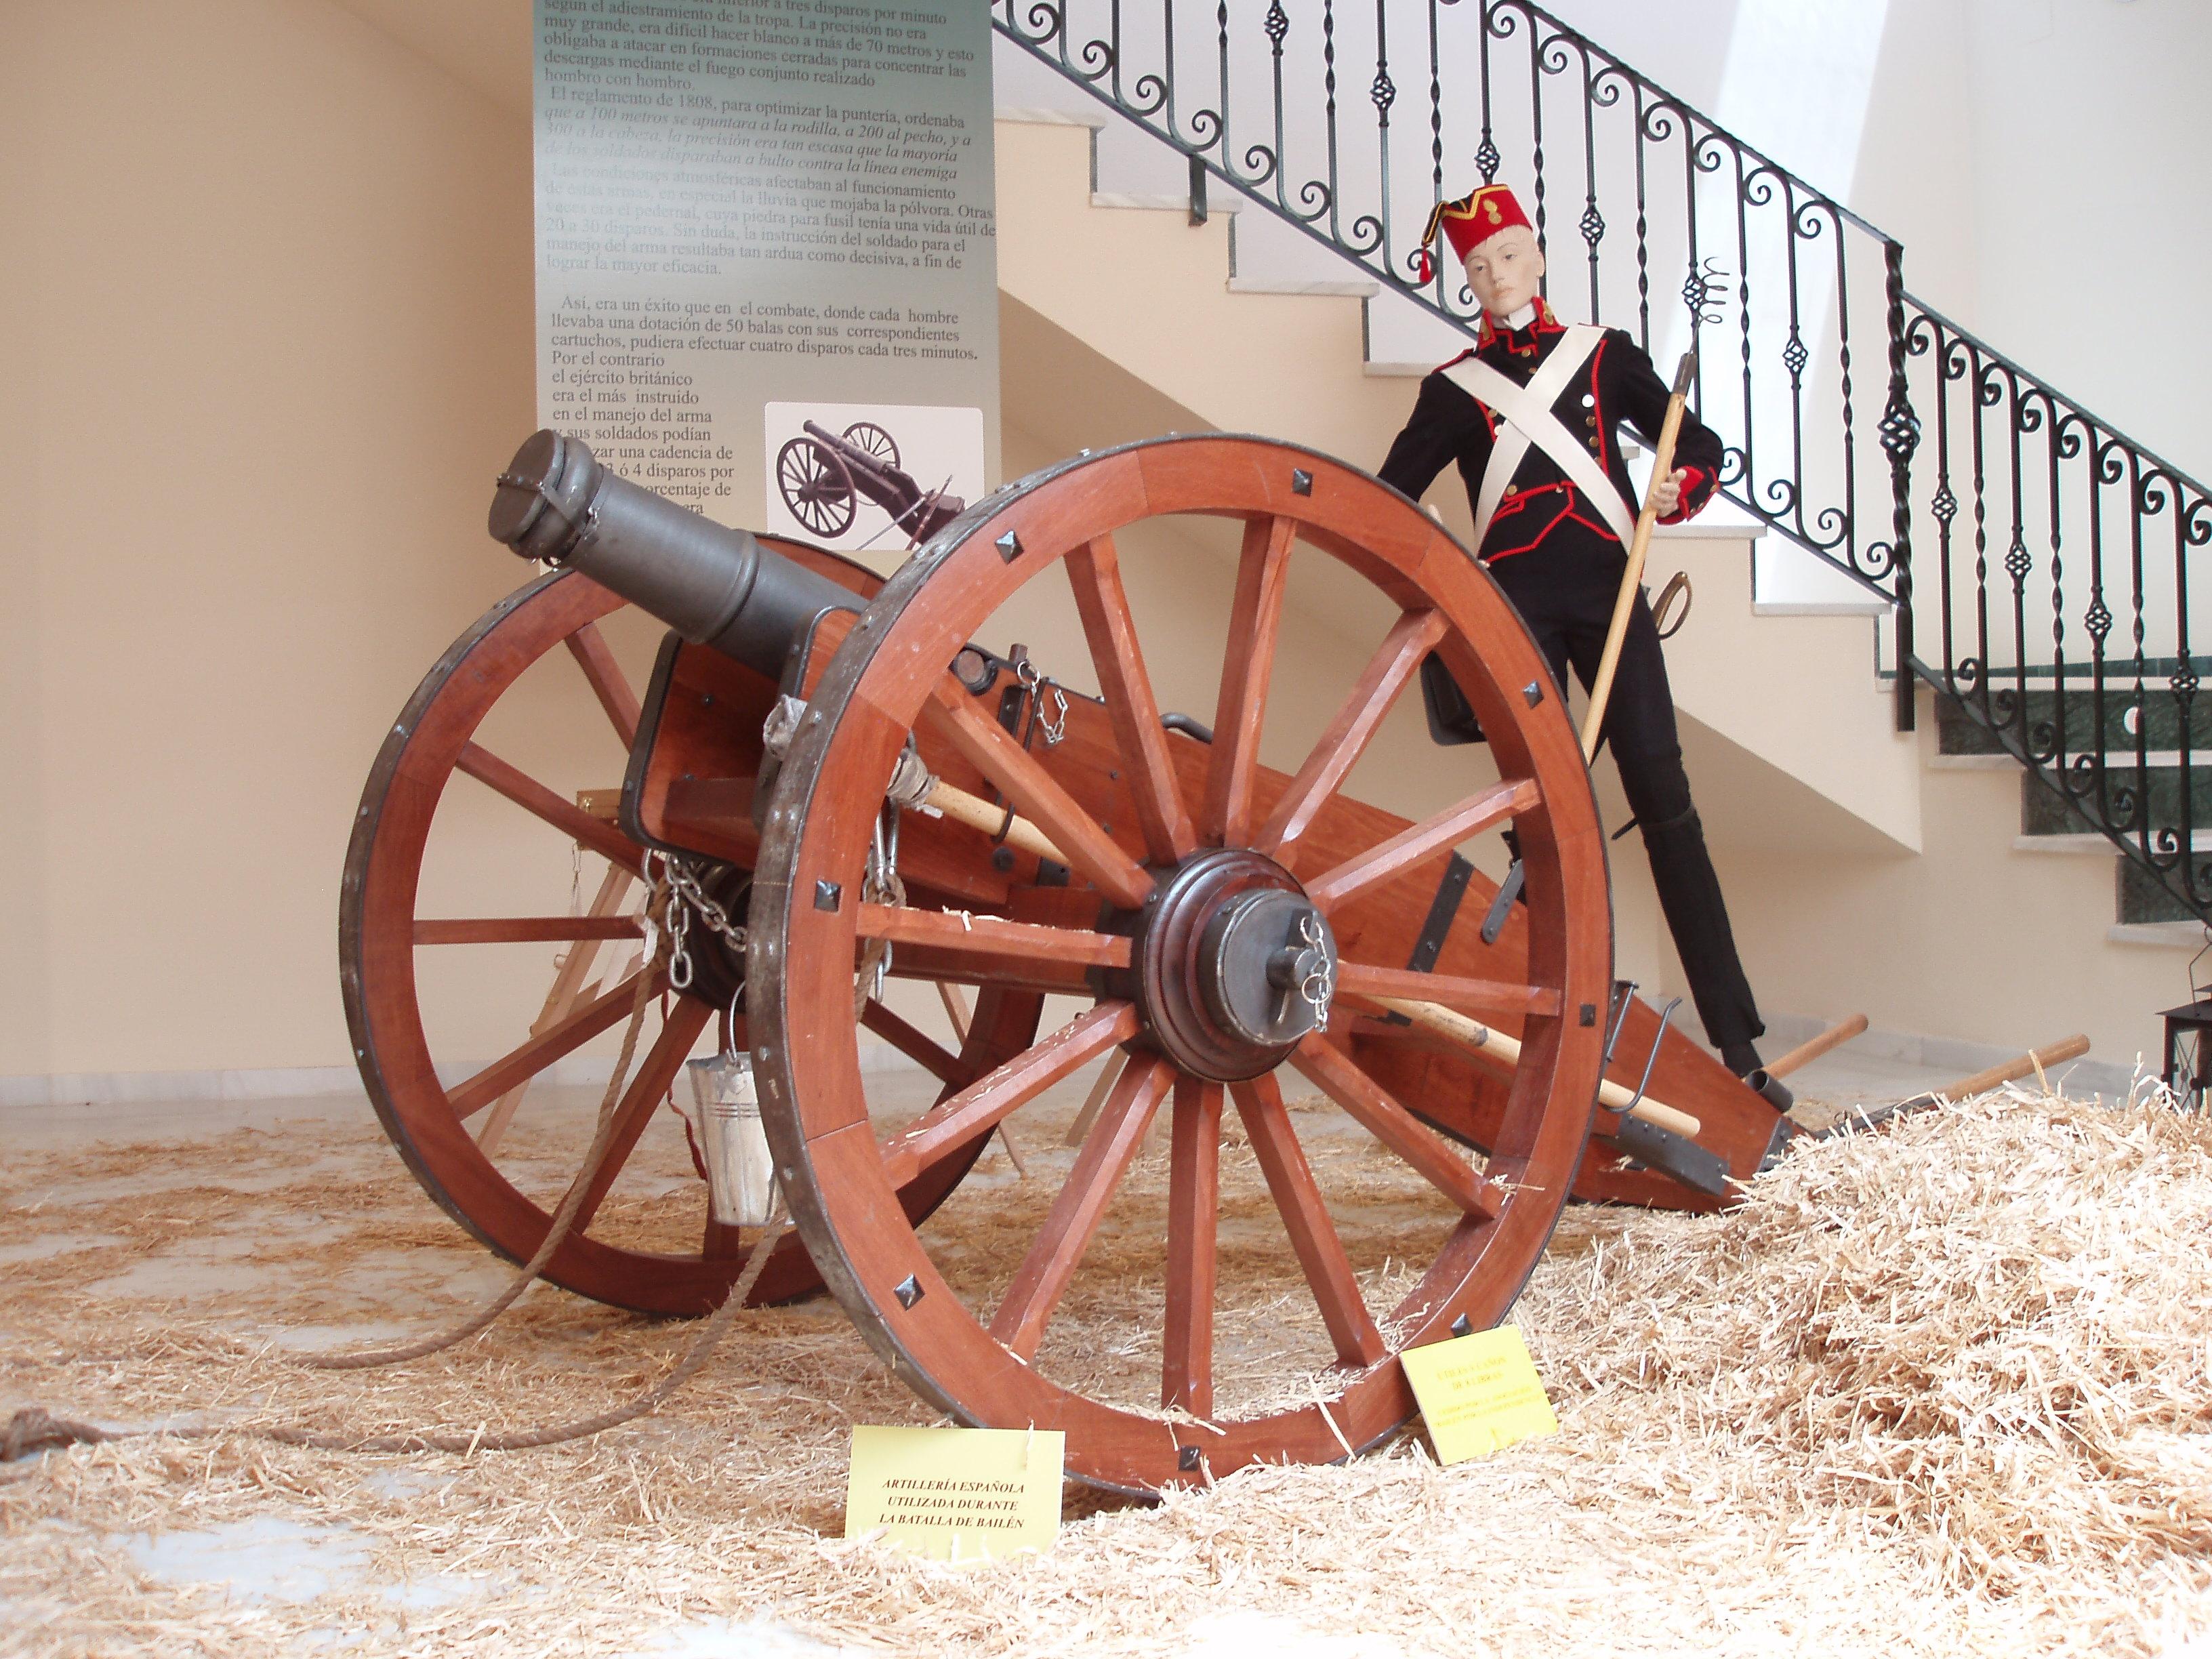 cañón_guerra_independencia_juan_valera_batalla_bailén